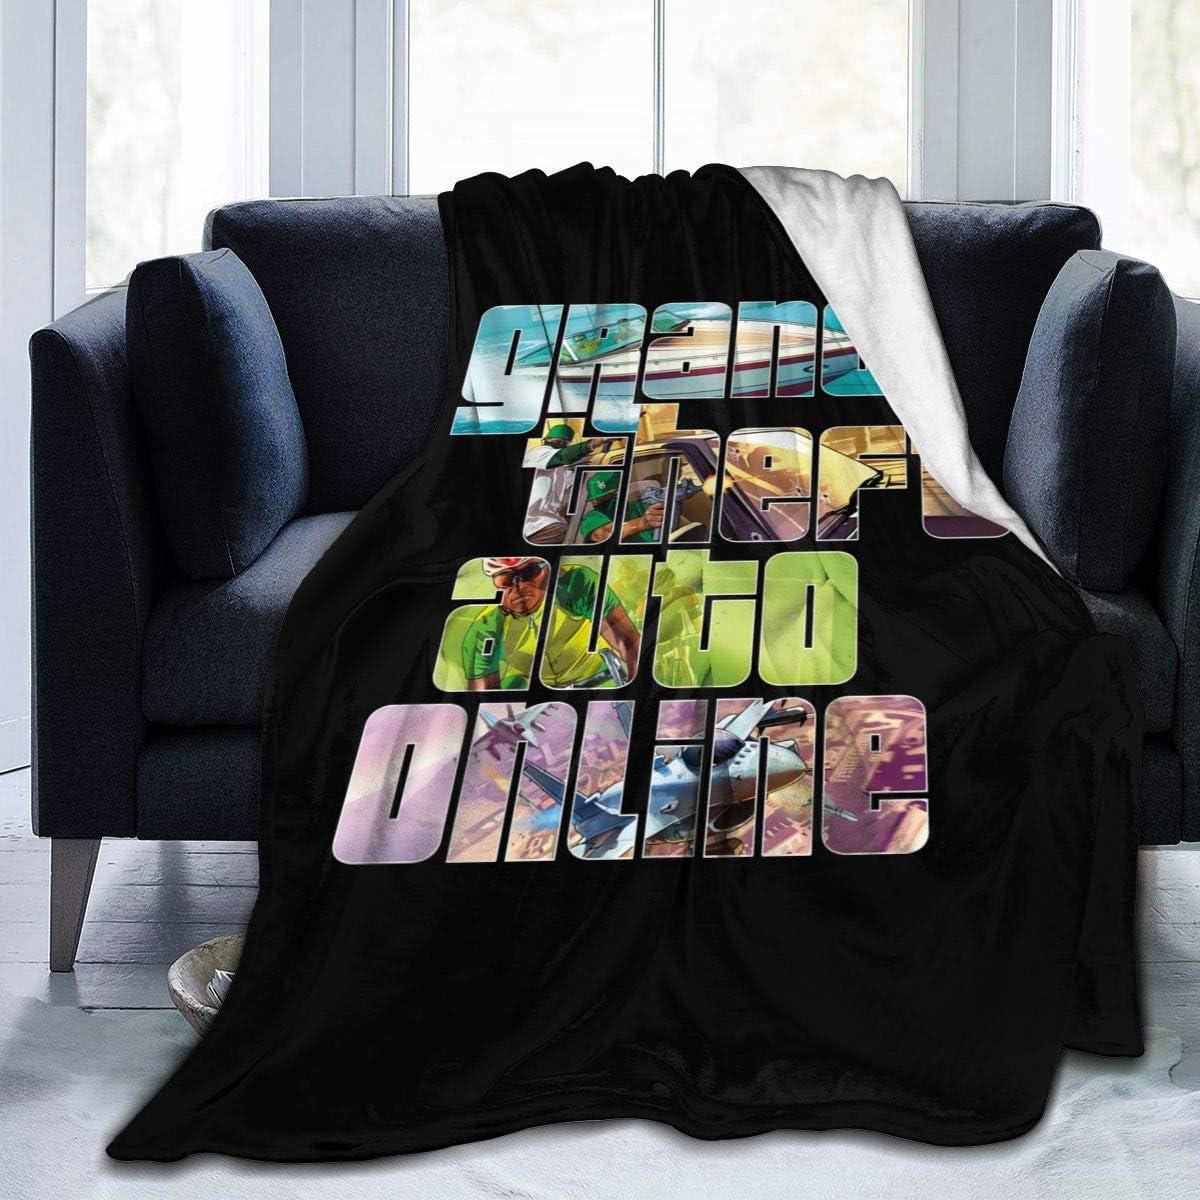 ASFSDGSDG Gta5 Grand Theft Auto V Soft and Warm Throw Blanket Digital Printed Ultra-Soft Micro Fleece Blanket(50 X40,60 X50,80 X60)